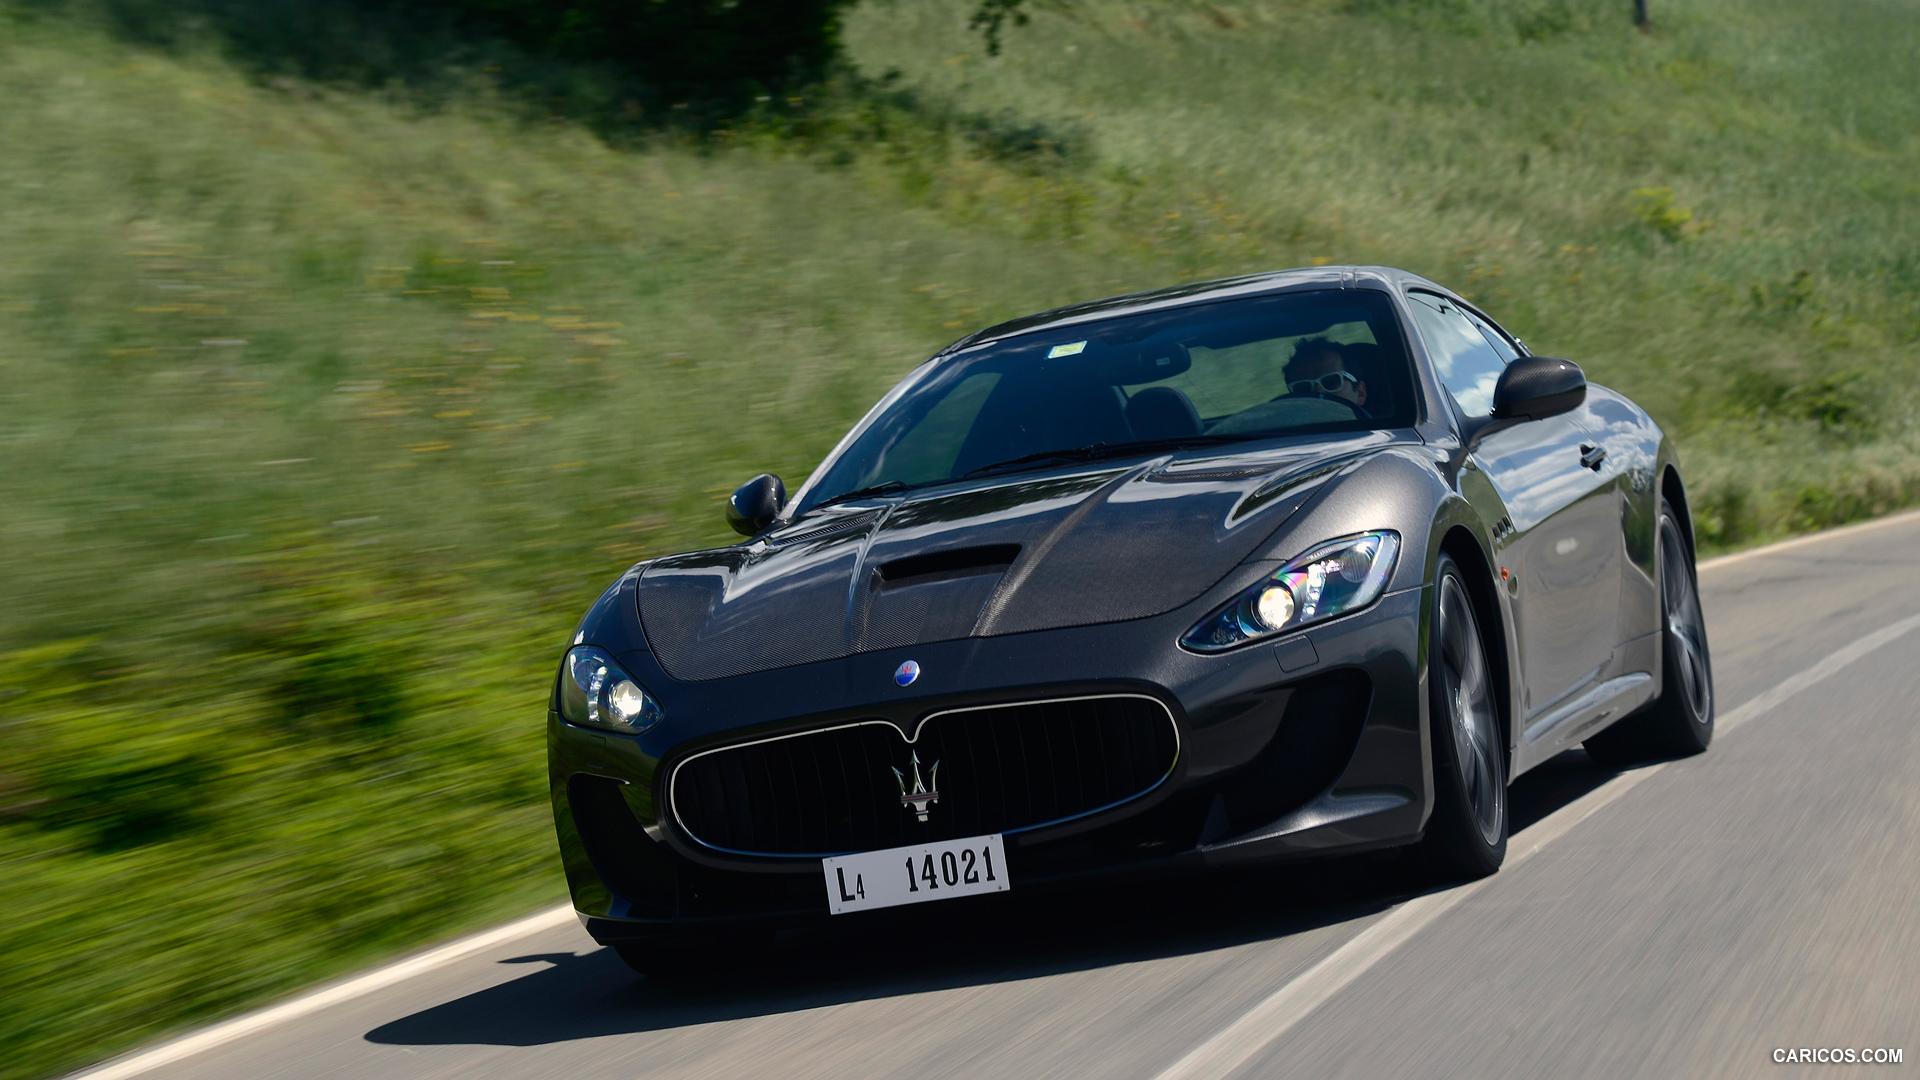 HQ 2014 Maserati GranTurismo MC Stradale Wallpapers | File 762.49Kb